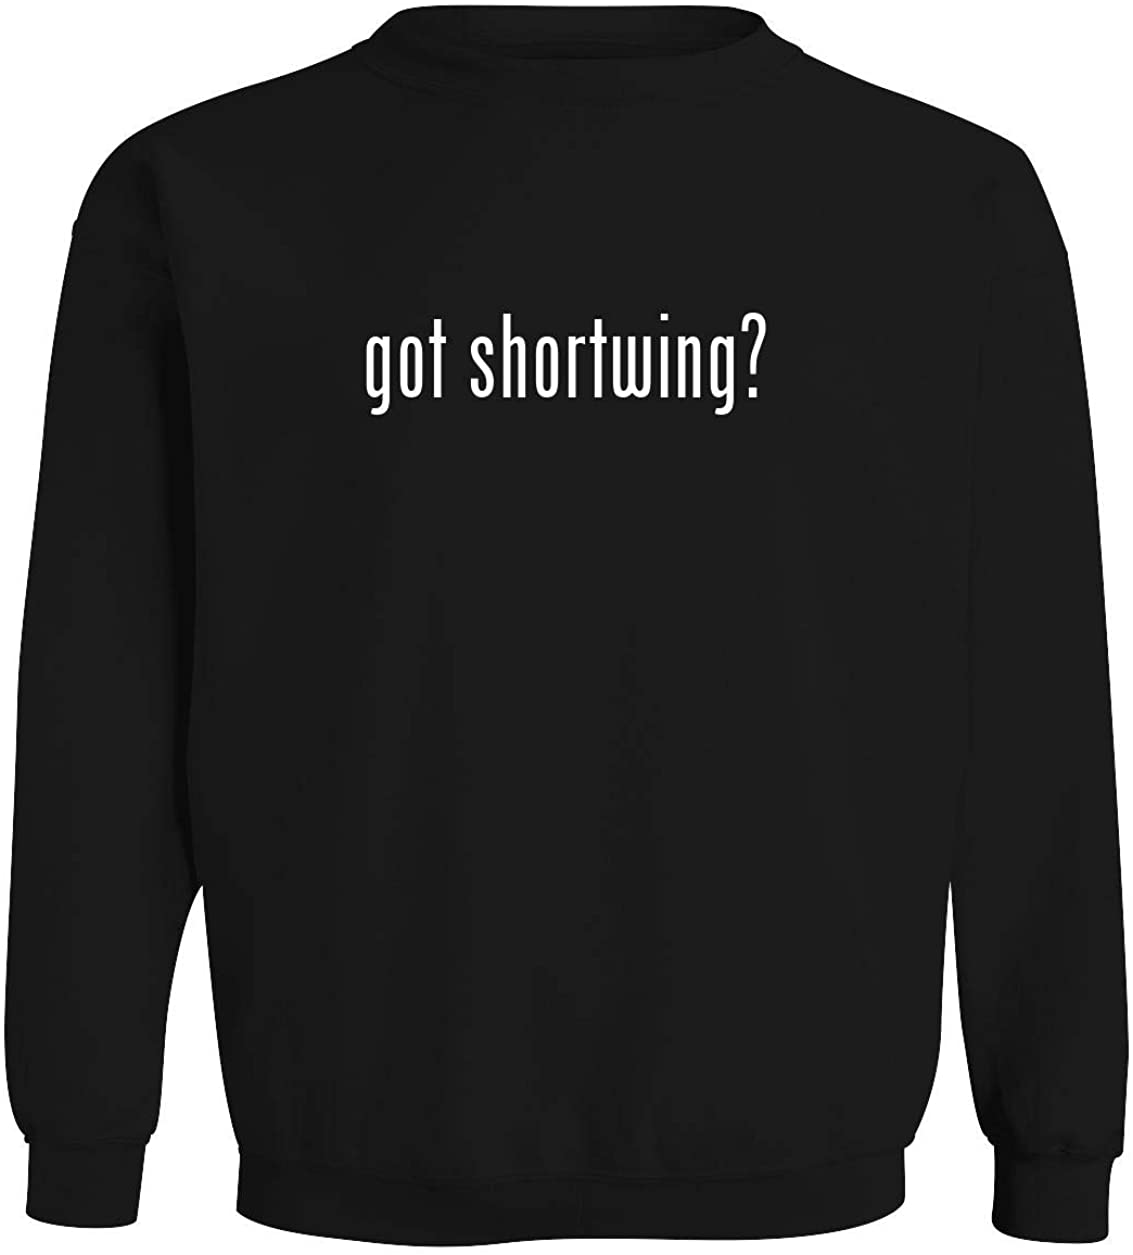 got shortwing? - Men's Soft & Comfortable Long Sleeve T-Shirt